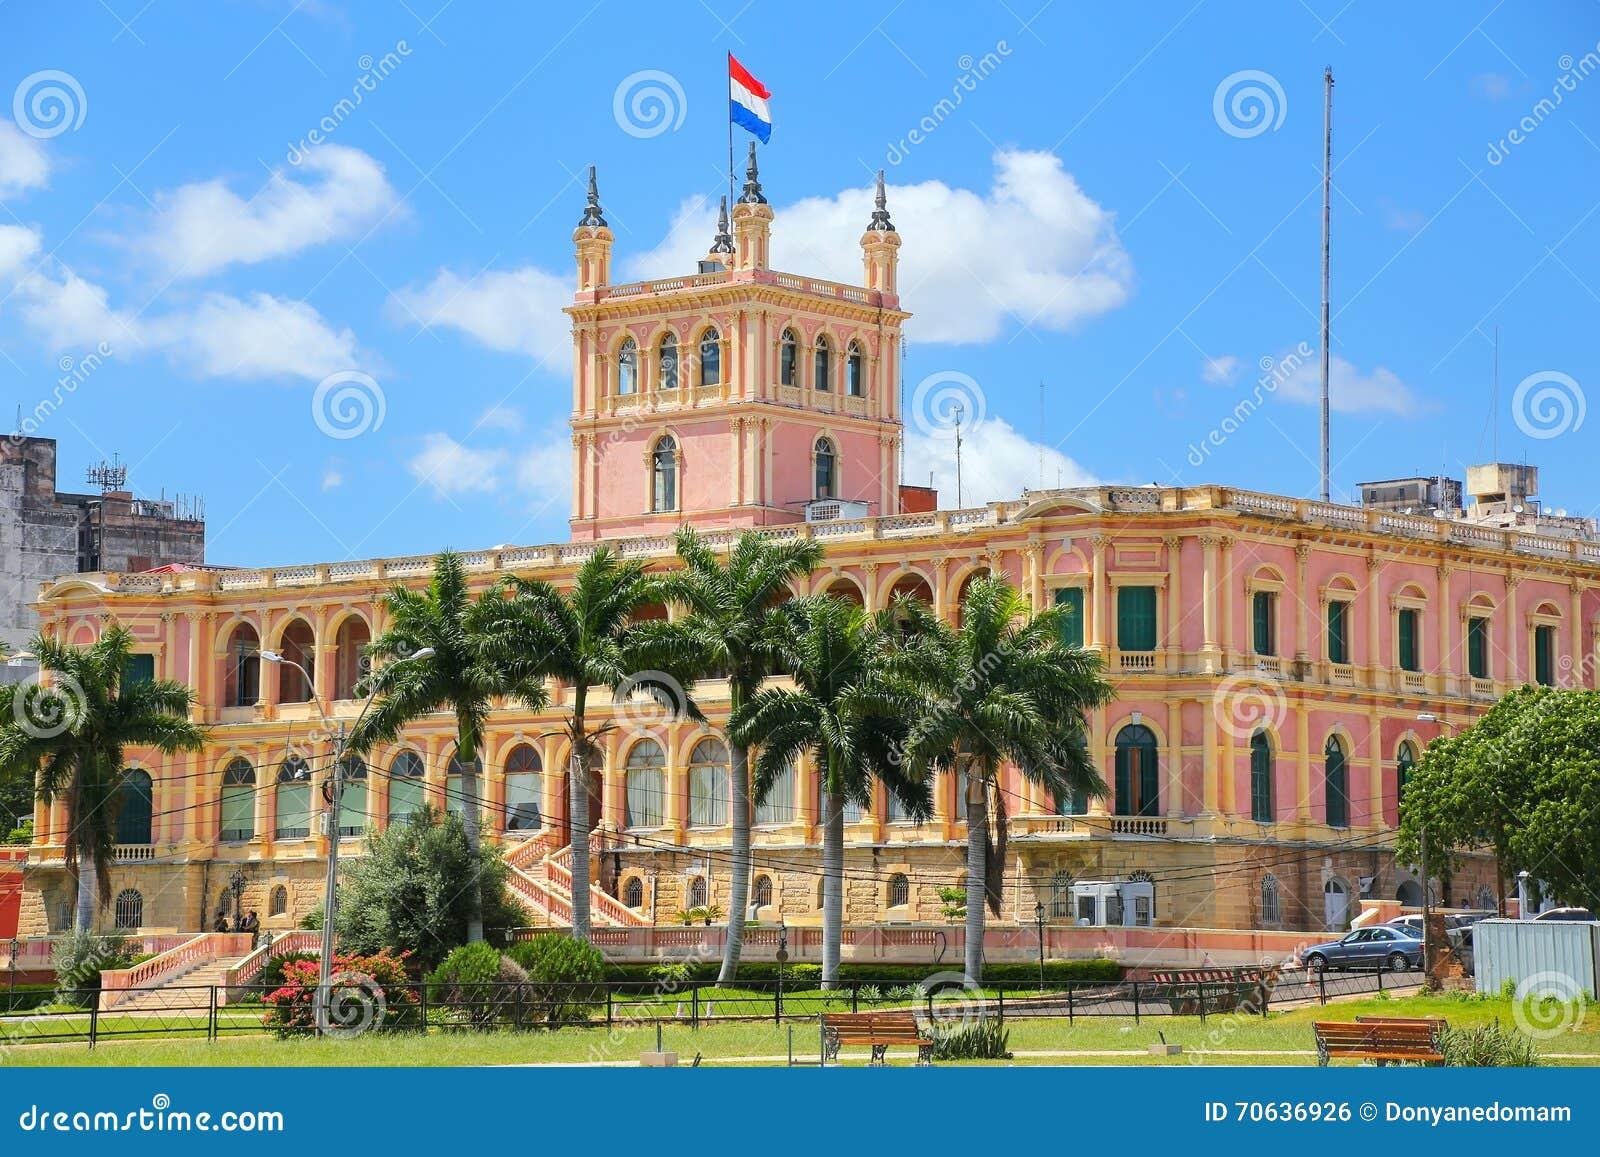 Palacio presidencial en Asuncion, Paraguay